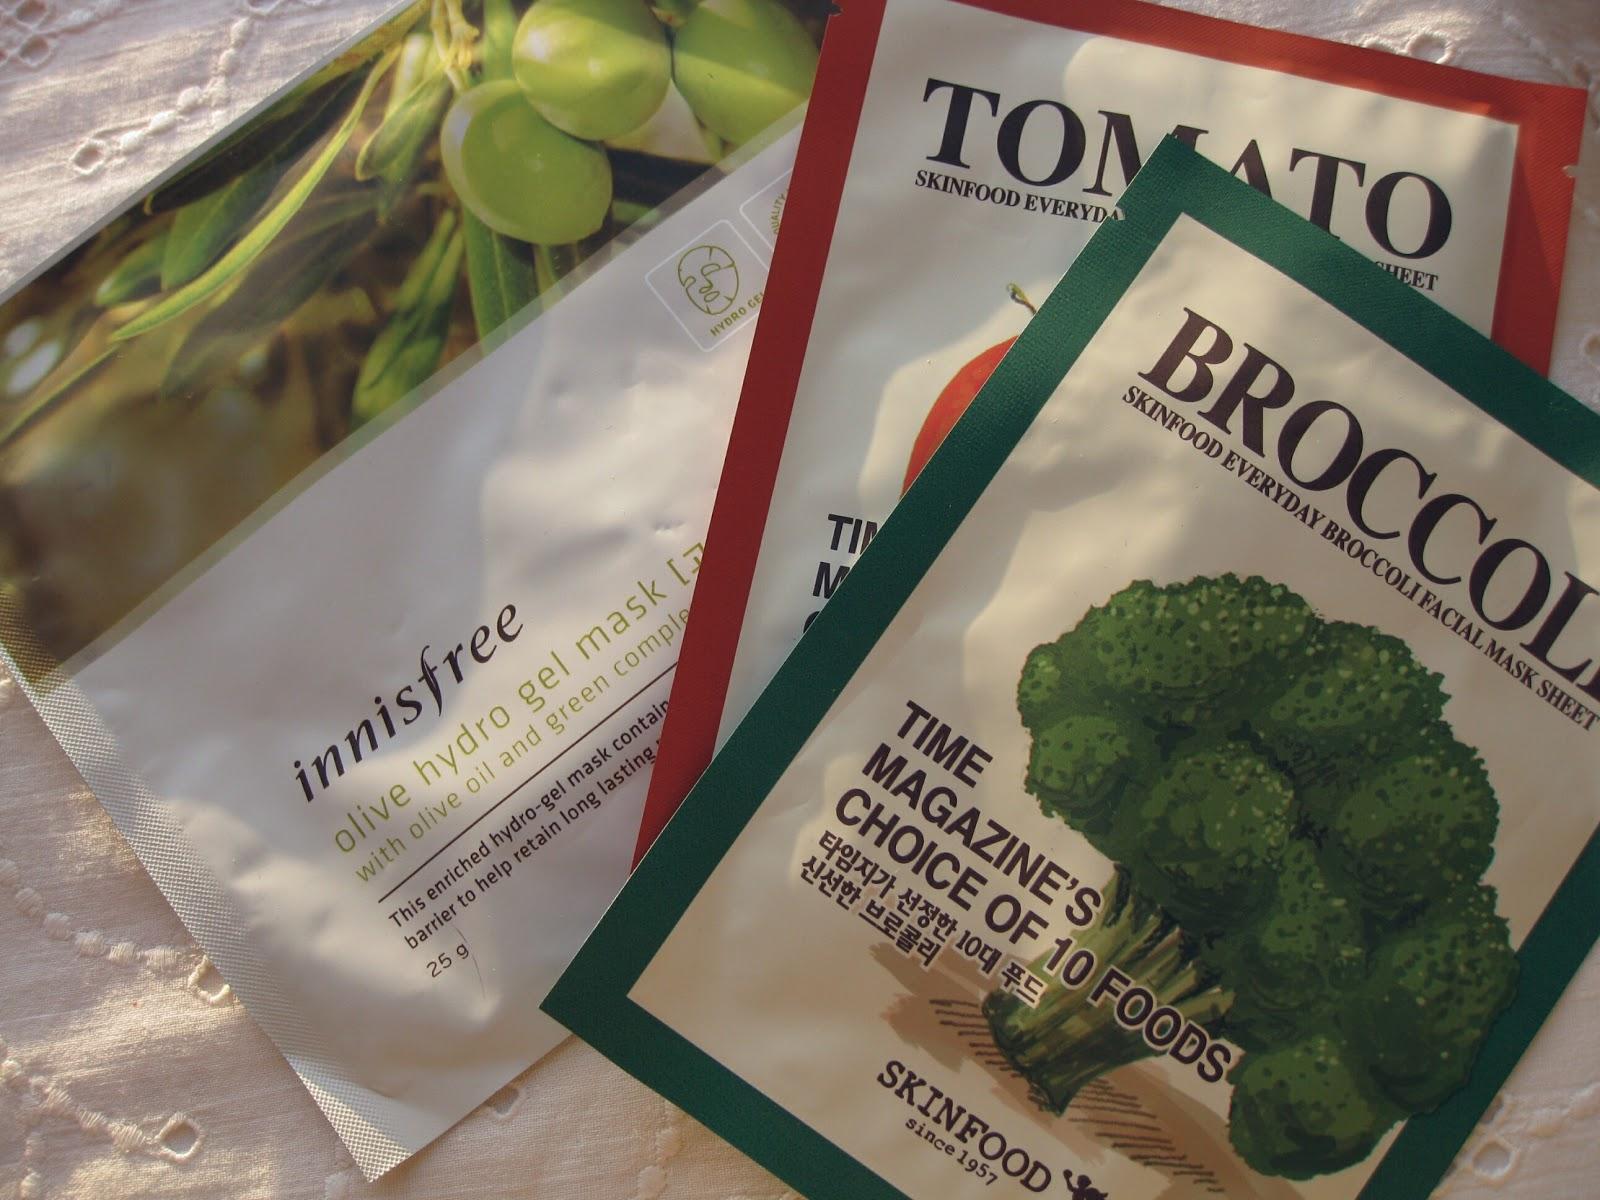 SKINFOOD Everyday Broccoli Facial Mask Sheet, INNISFREE Hydro Gel Mask